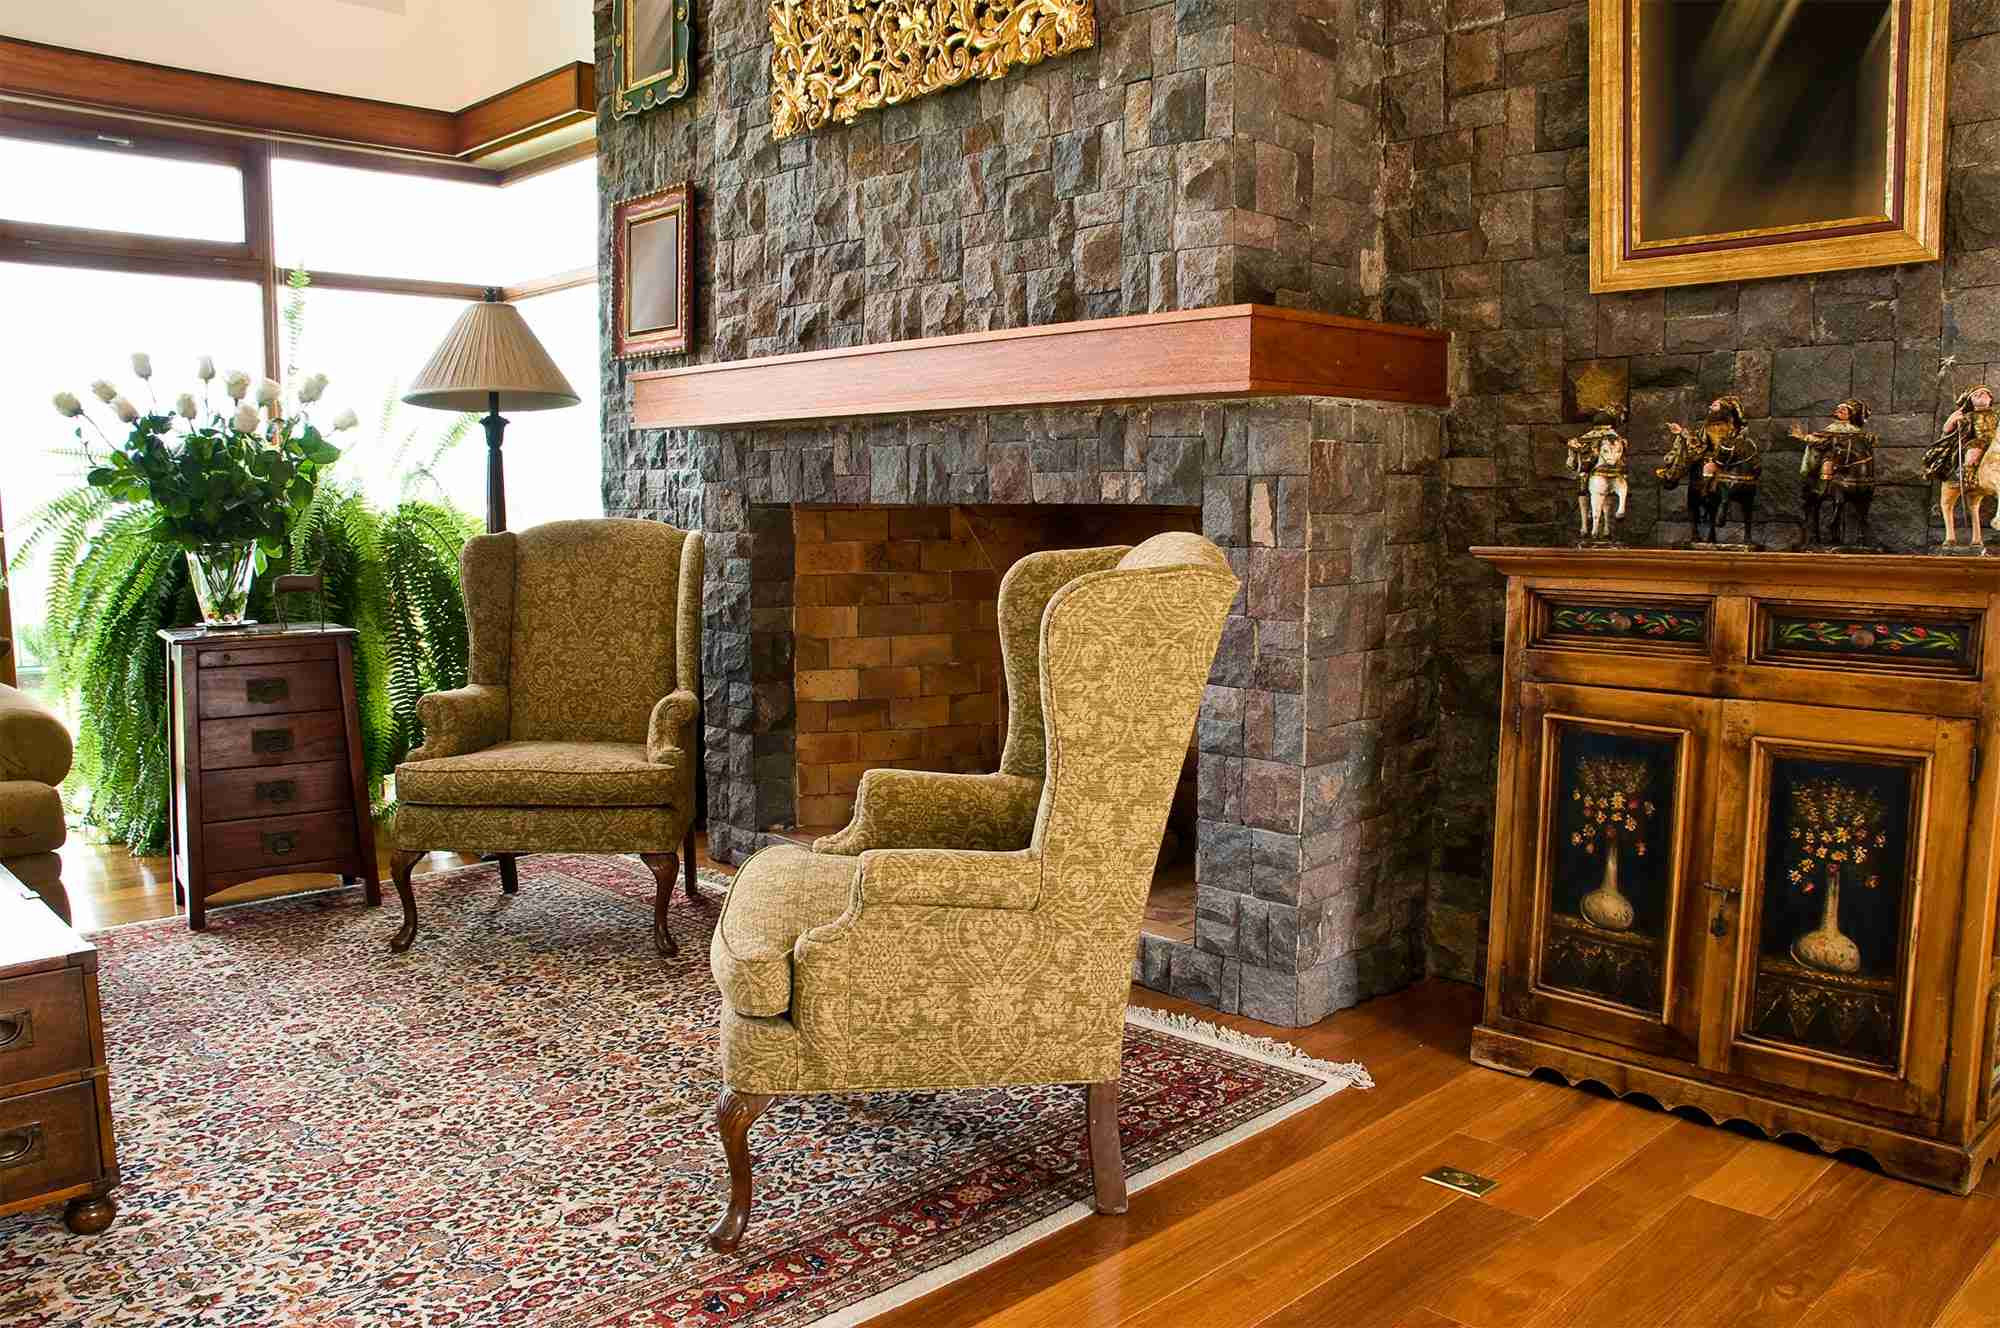 Home Interior with Estate Sale Furniture